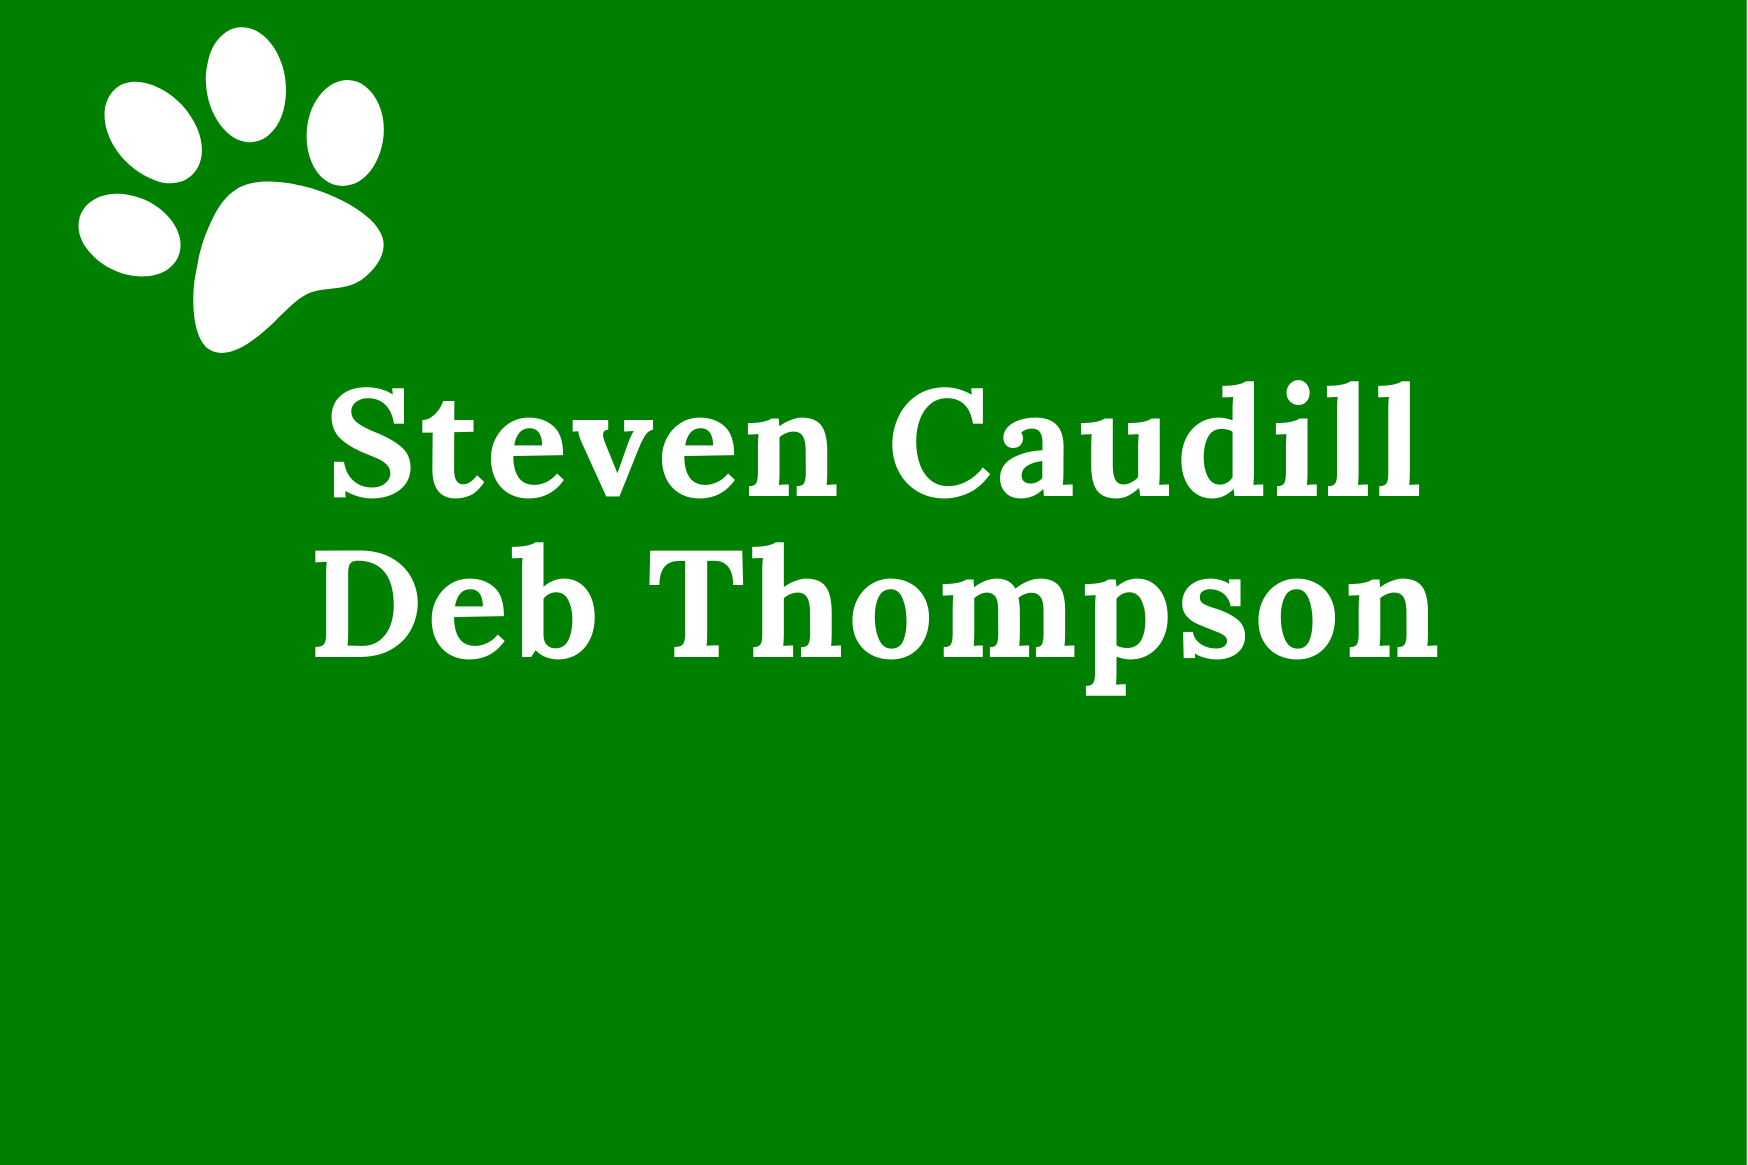 Steven Caudill Deb Thompson